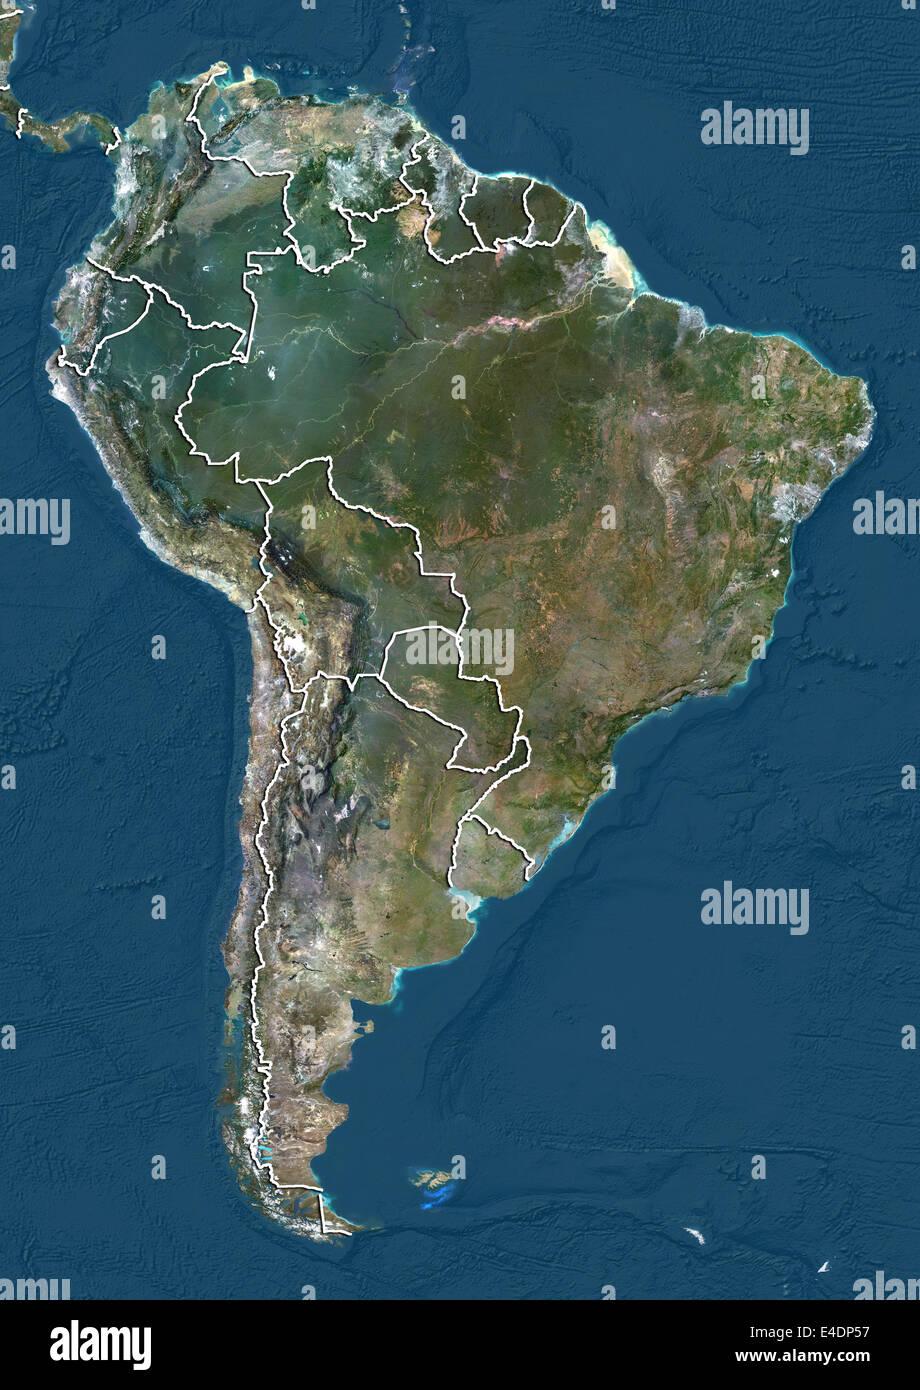 South America Satellite Map on